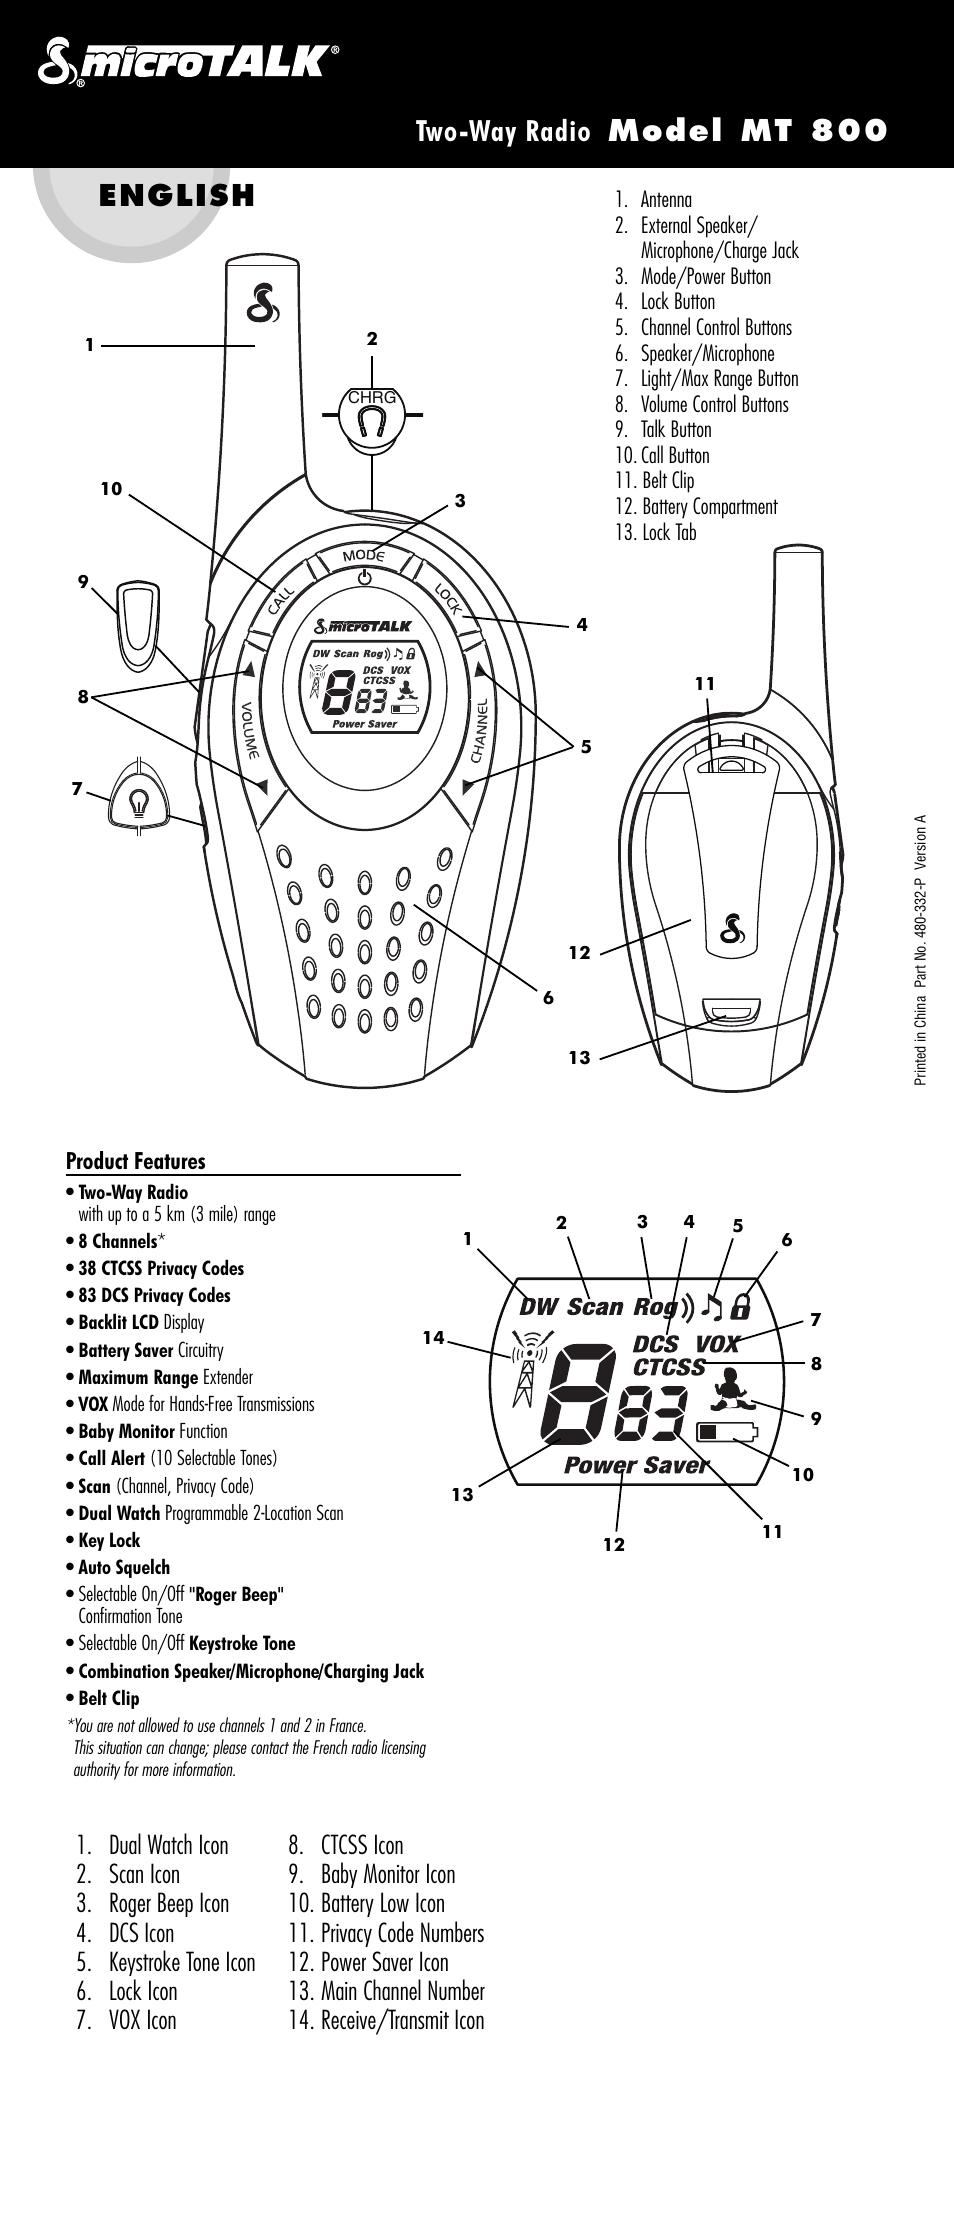 cobra electronics microtalk mt 800 user manual